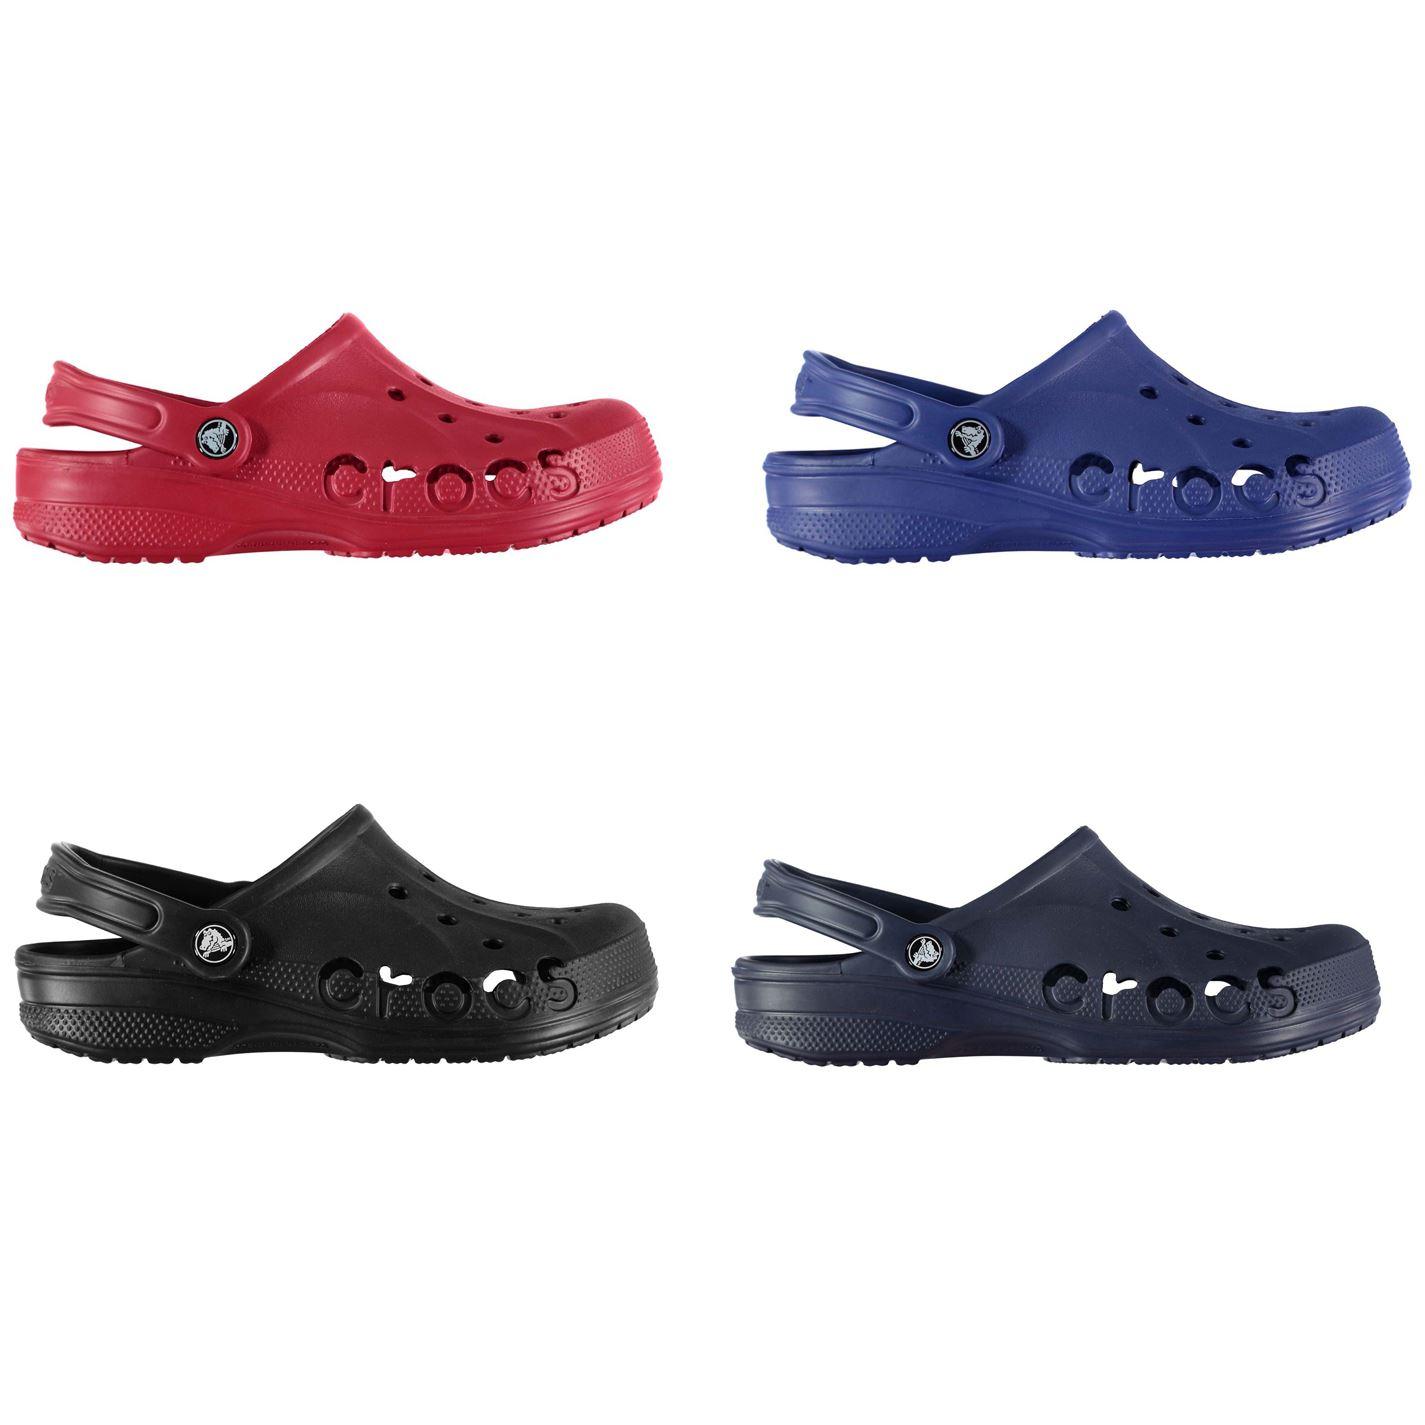 huge discount 4ded0 750b0 Details about Crocs Baya Clogs Juniors Boys Sandals Flip Flops Thongs Beach  Shoes